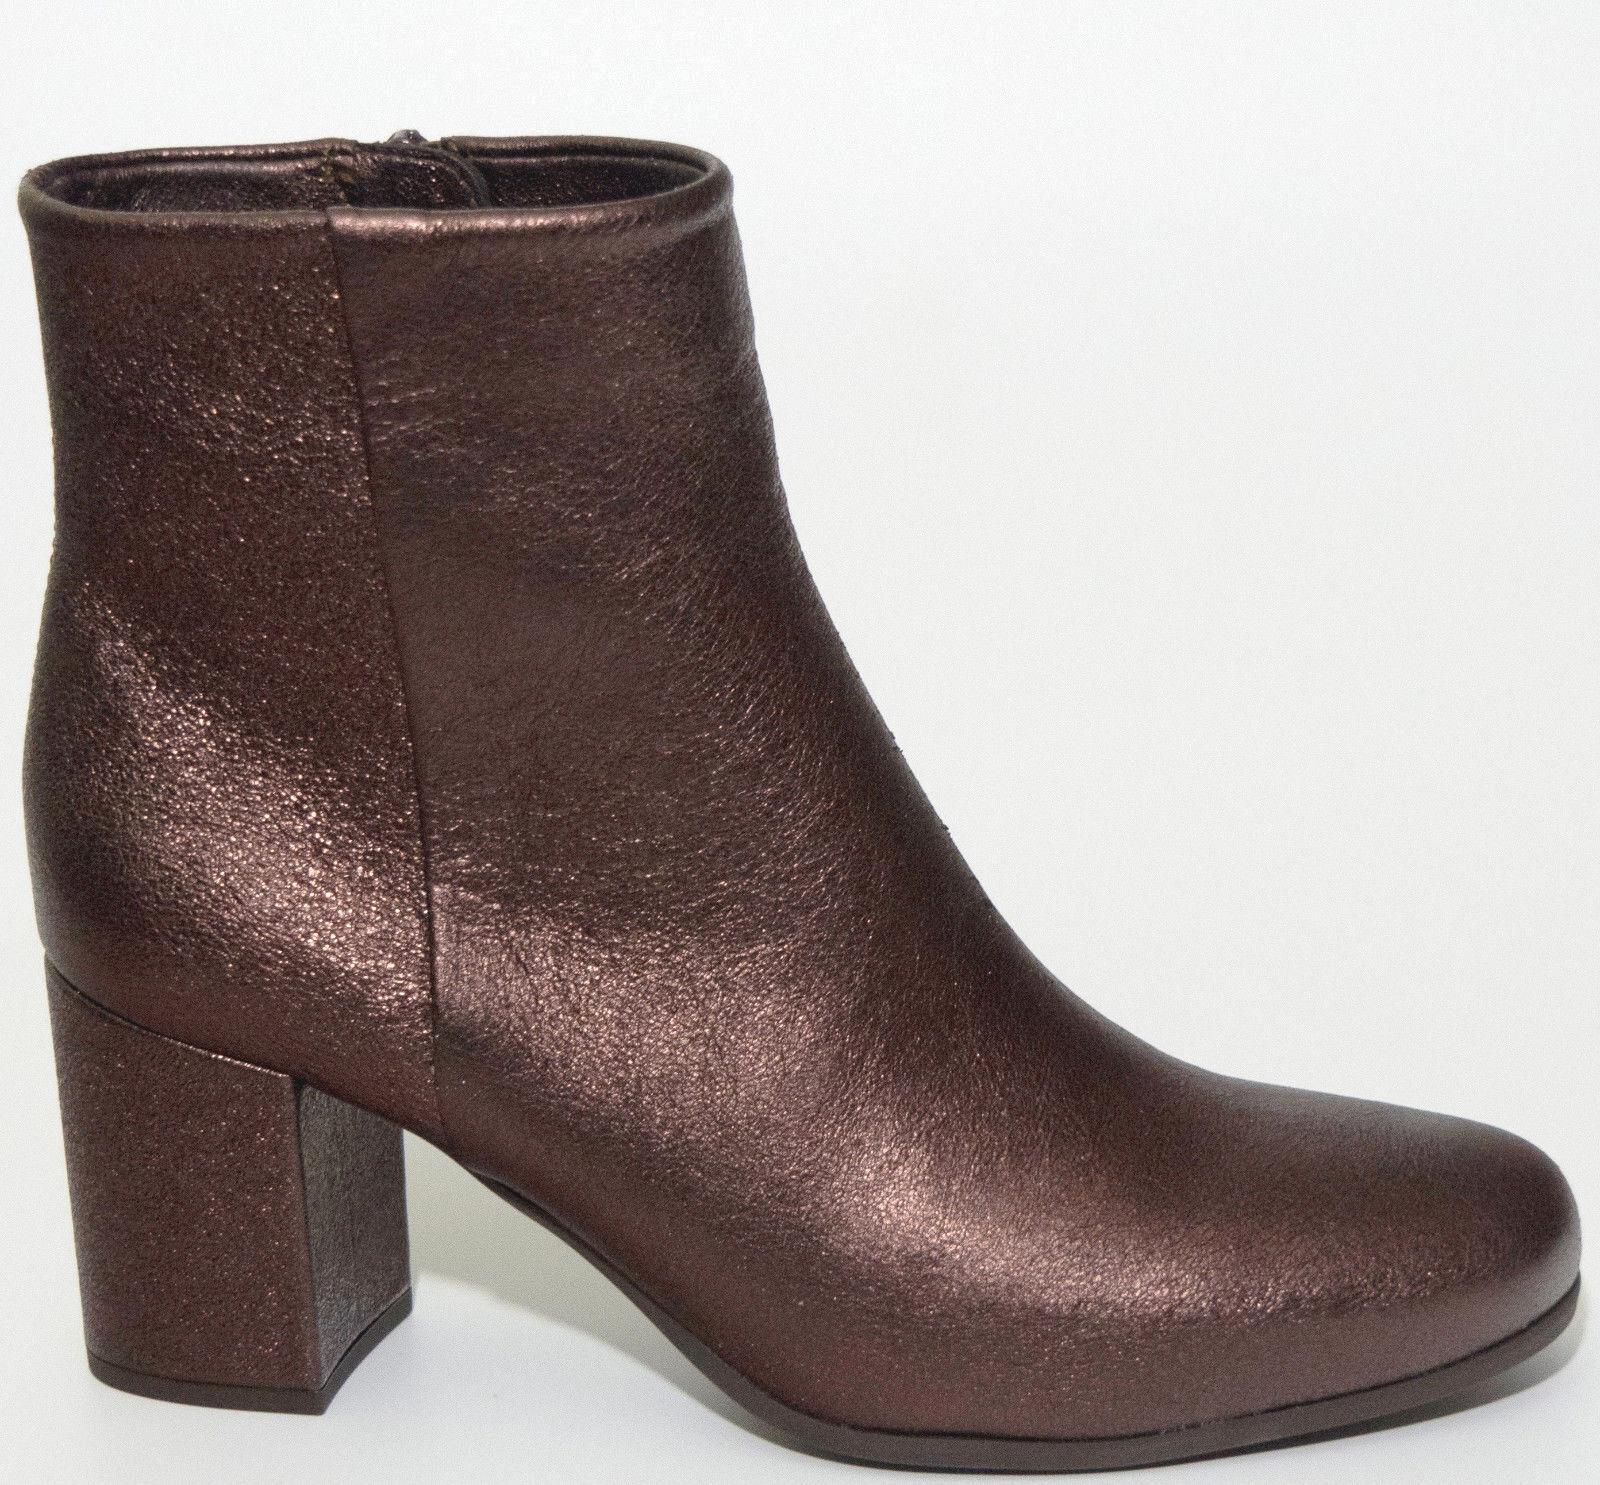 UNISA tobillo bota 39 cuero cobre marrón metálico metálico marrón brillo botas hecho España zapato nuevo 69fae8